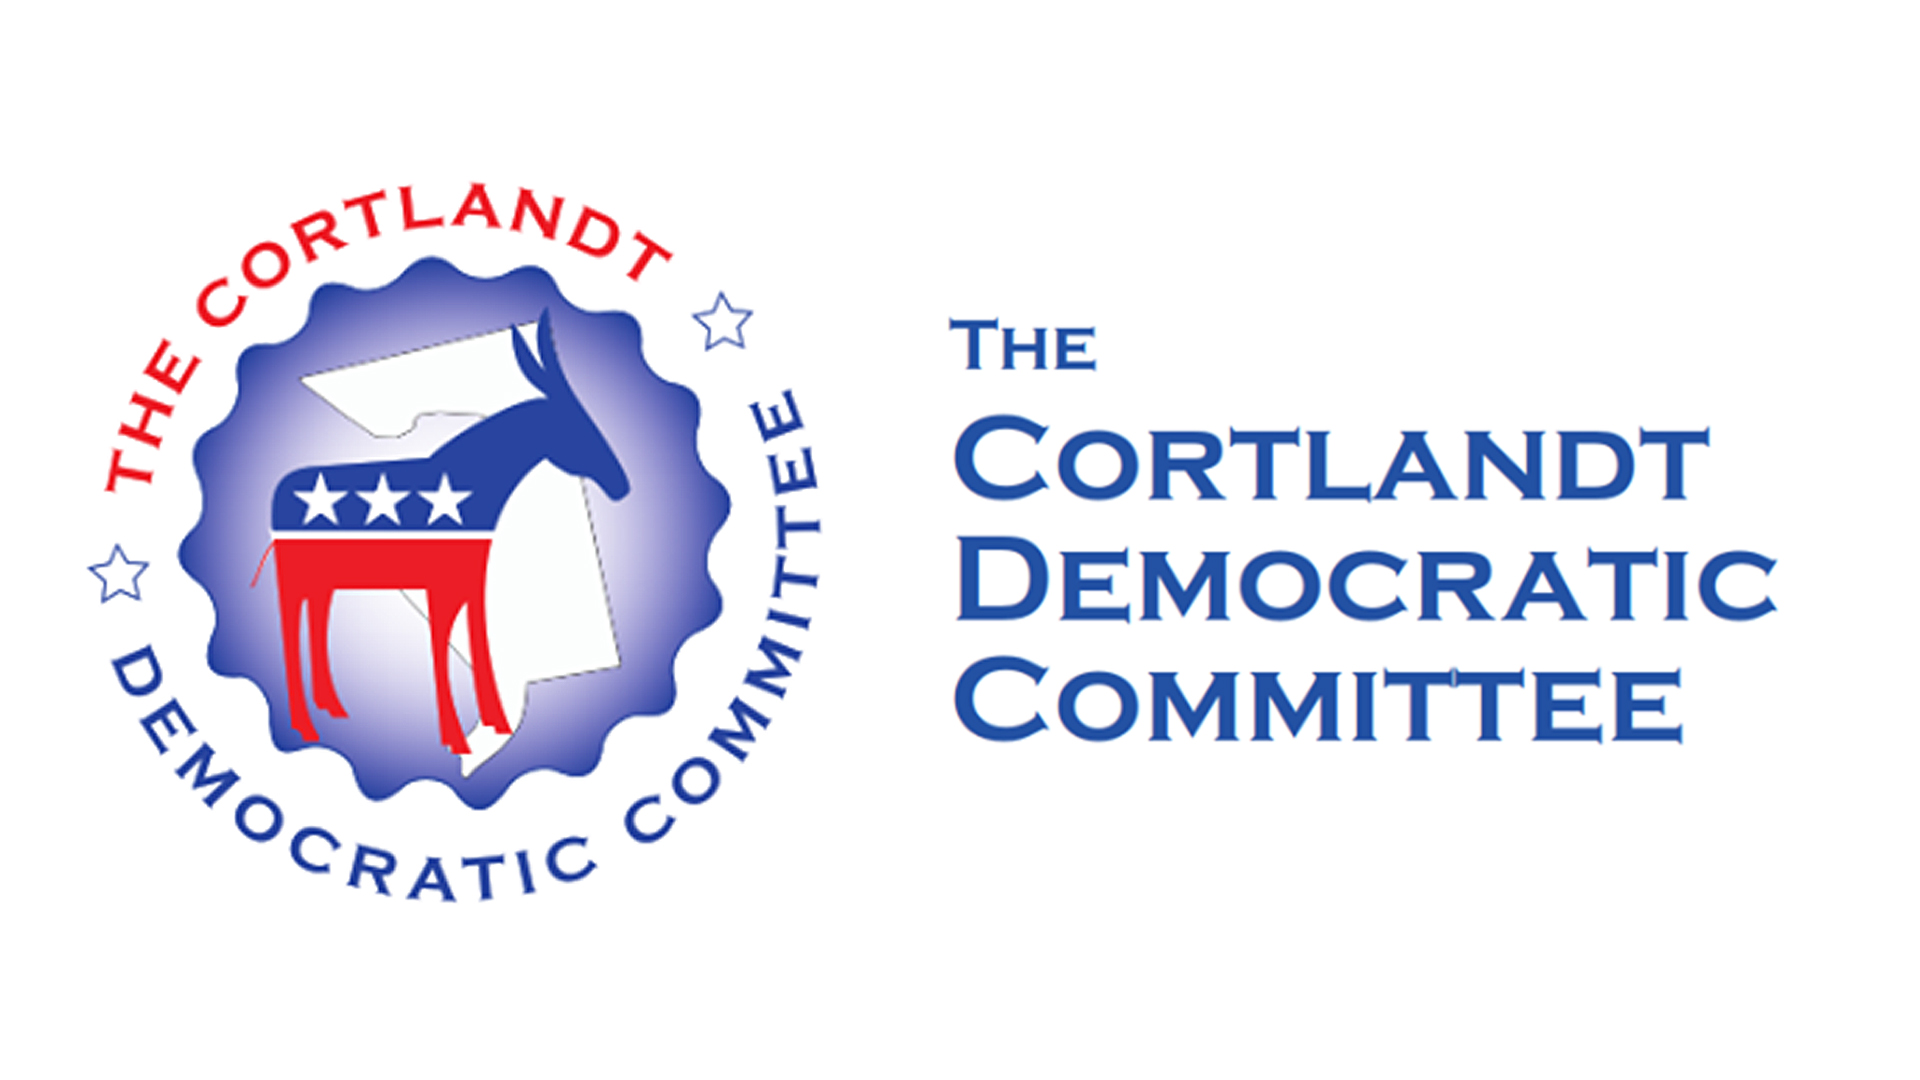 Cortlandt Democratic Committee (NY)